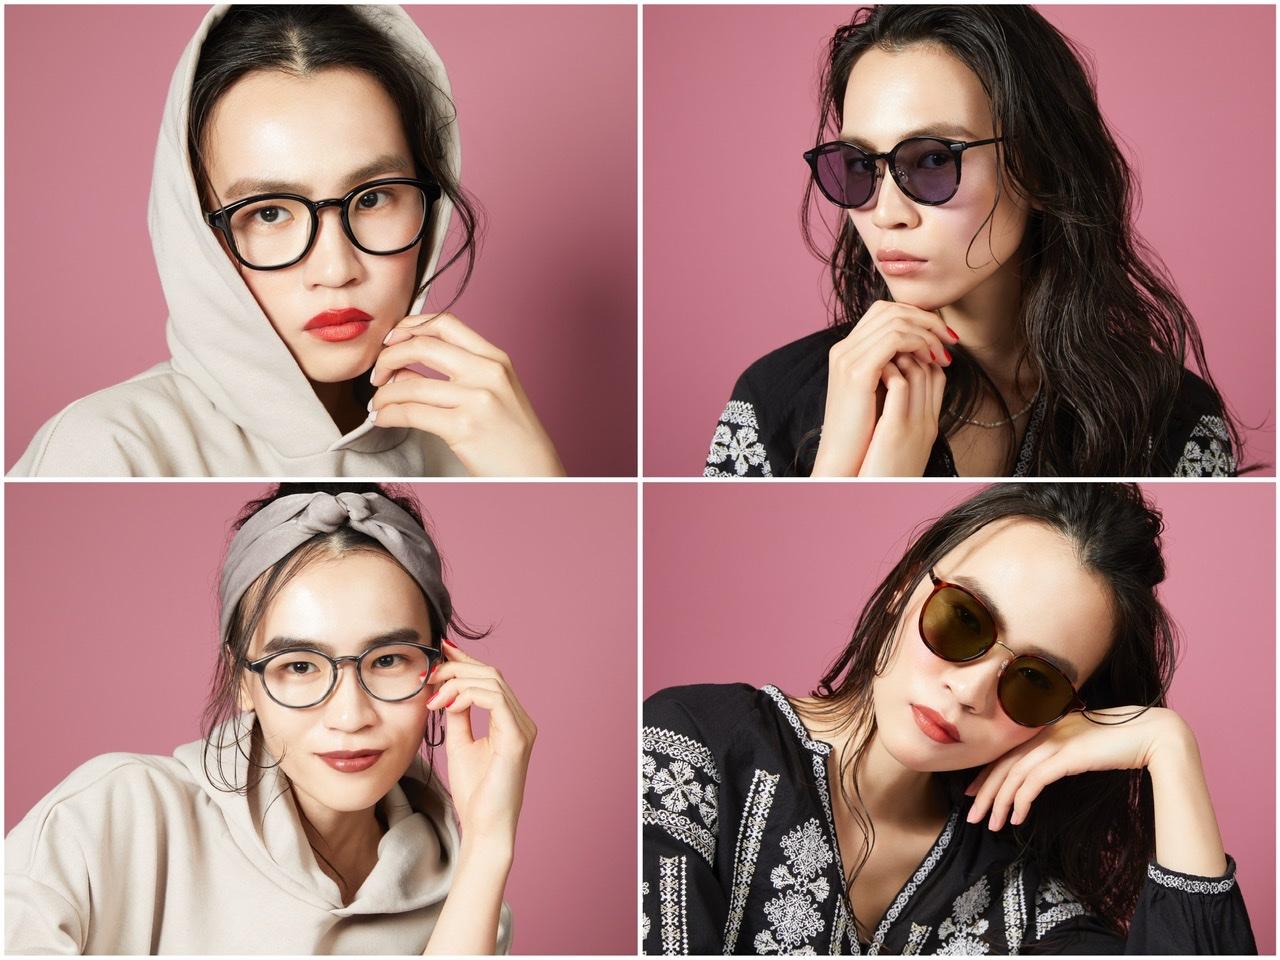 『JINS×イガリシノブ』ついに発売‼︎ 働く女子の理想を叶える「メガネ愛好課」シリーズ全部見せ♡_3